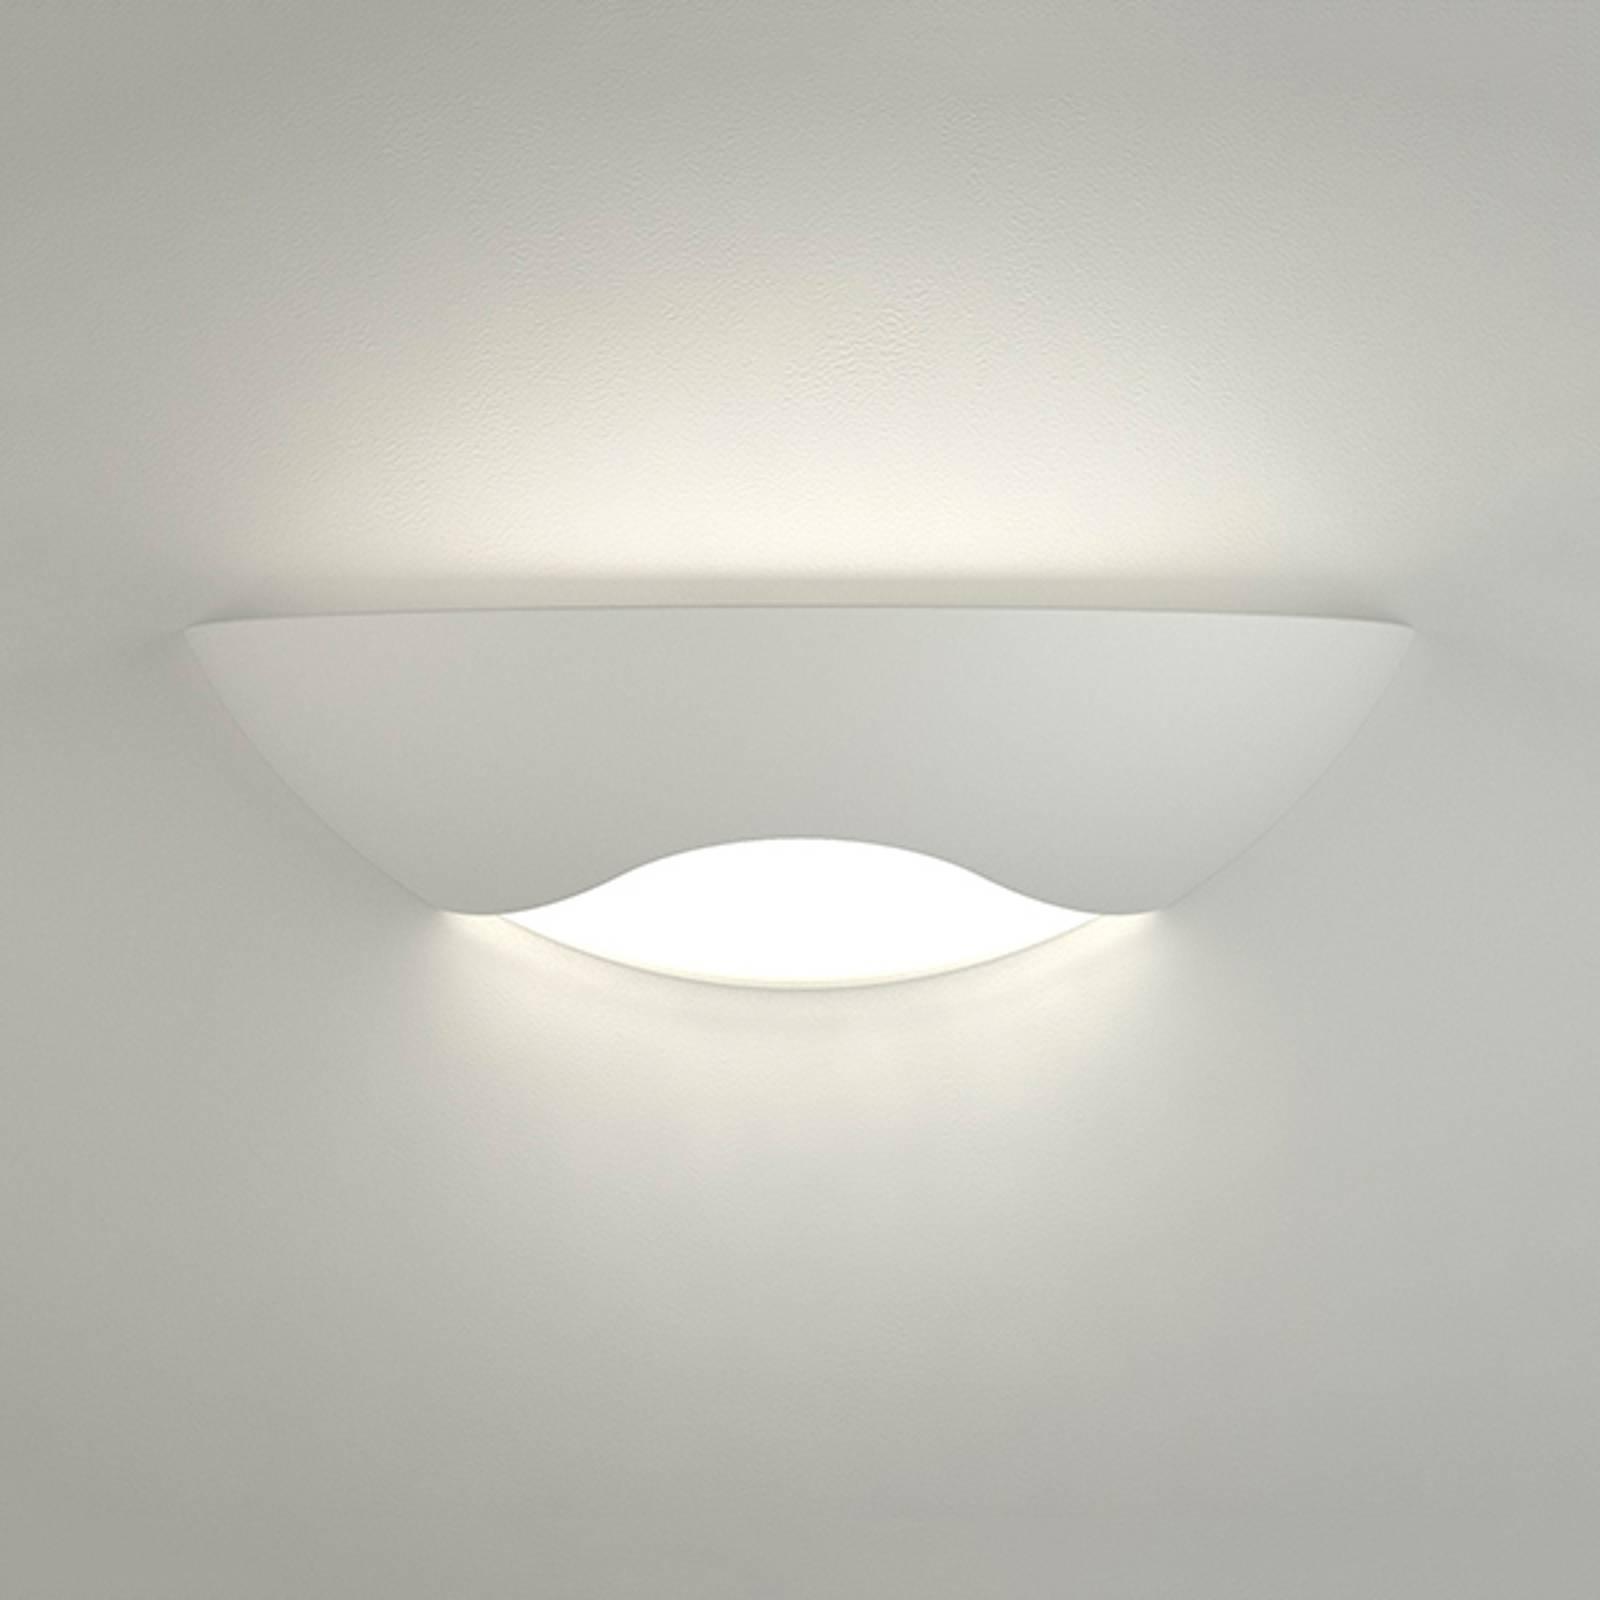 LED wandlamp Ambra uit keramiek halfrond